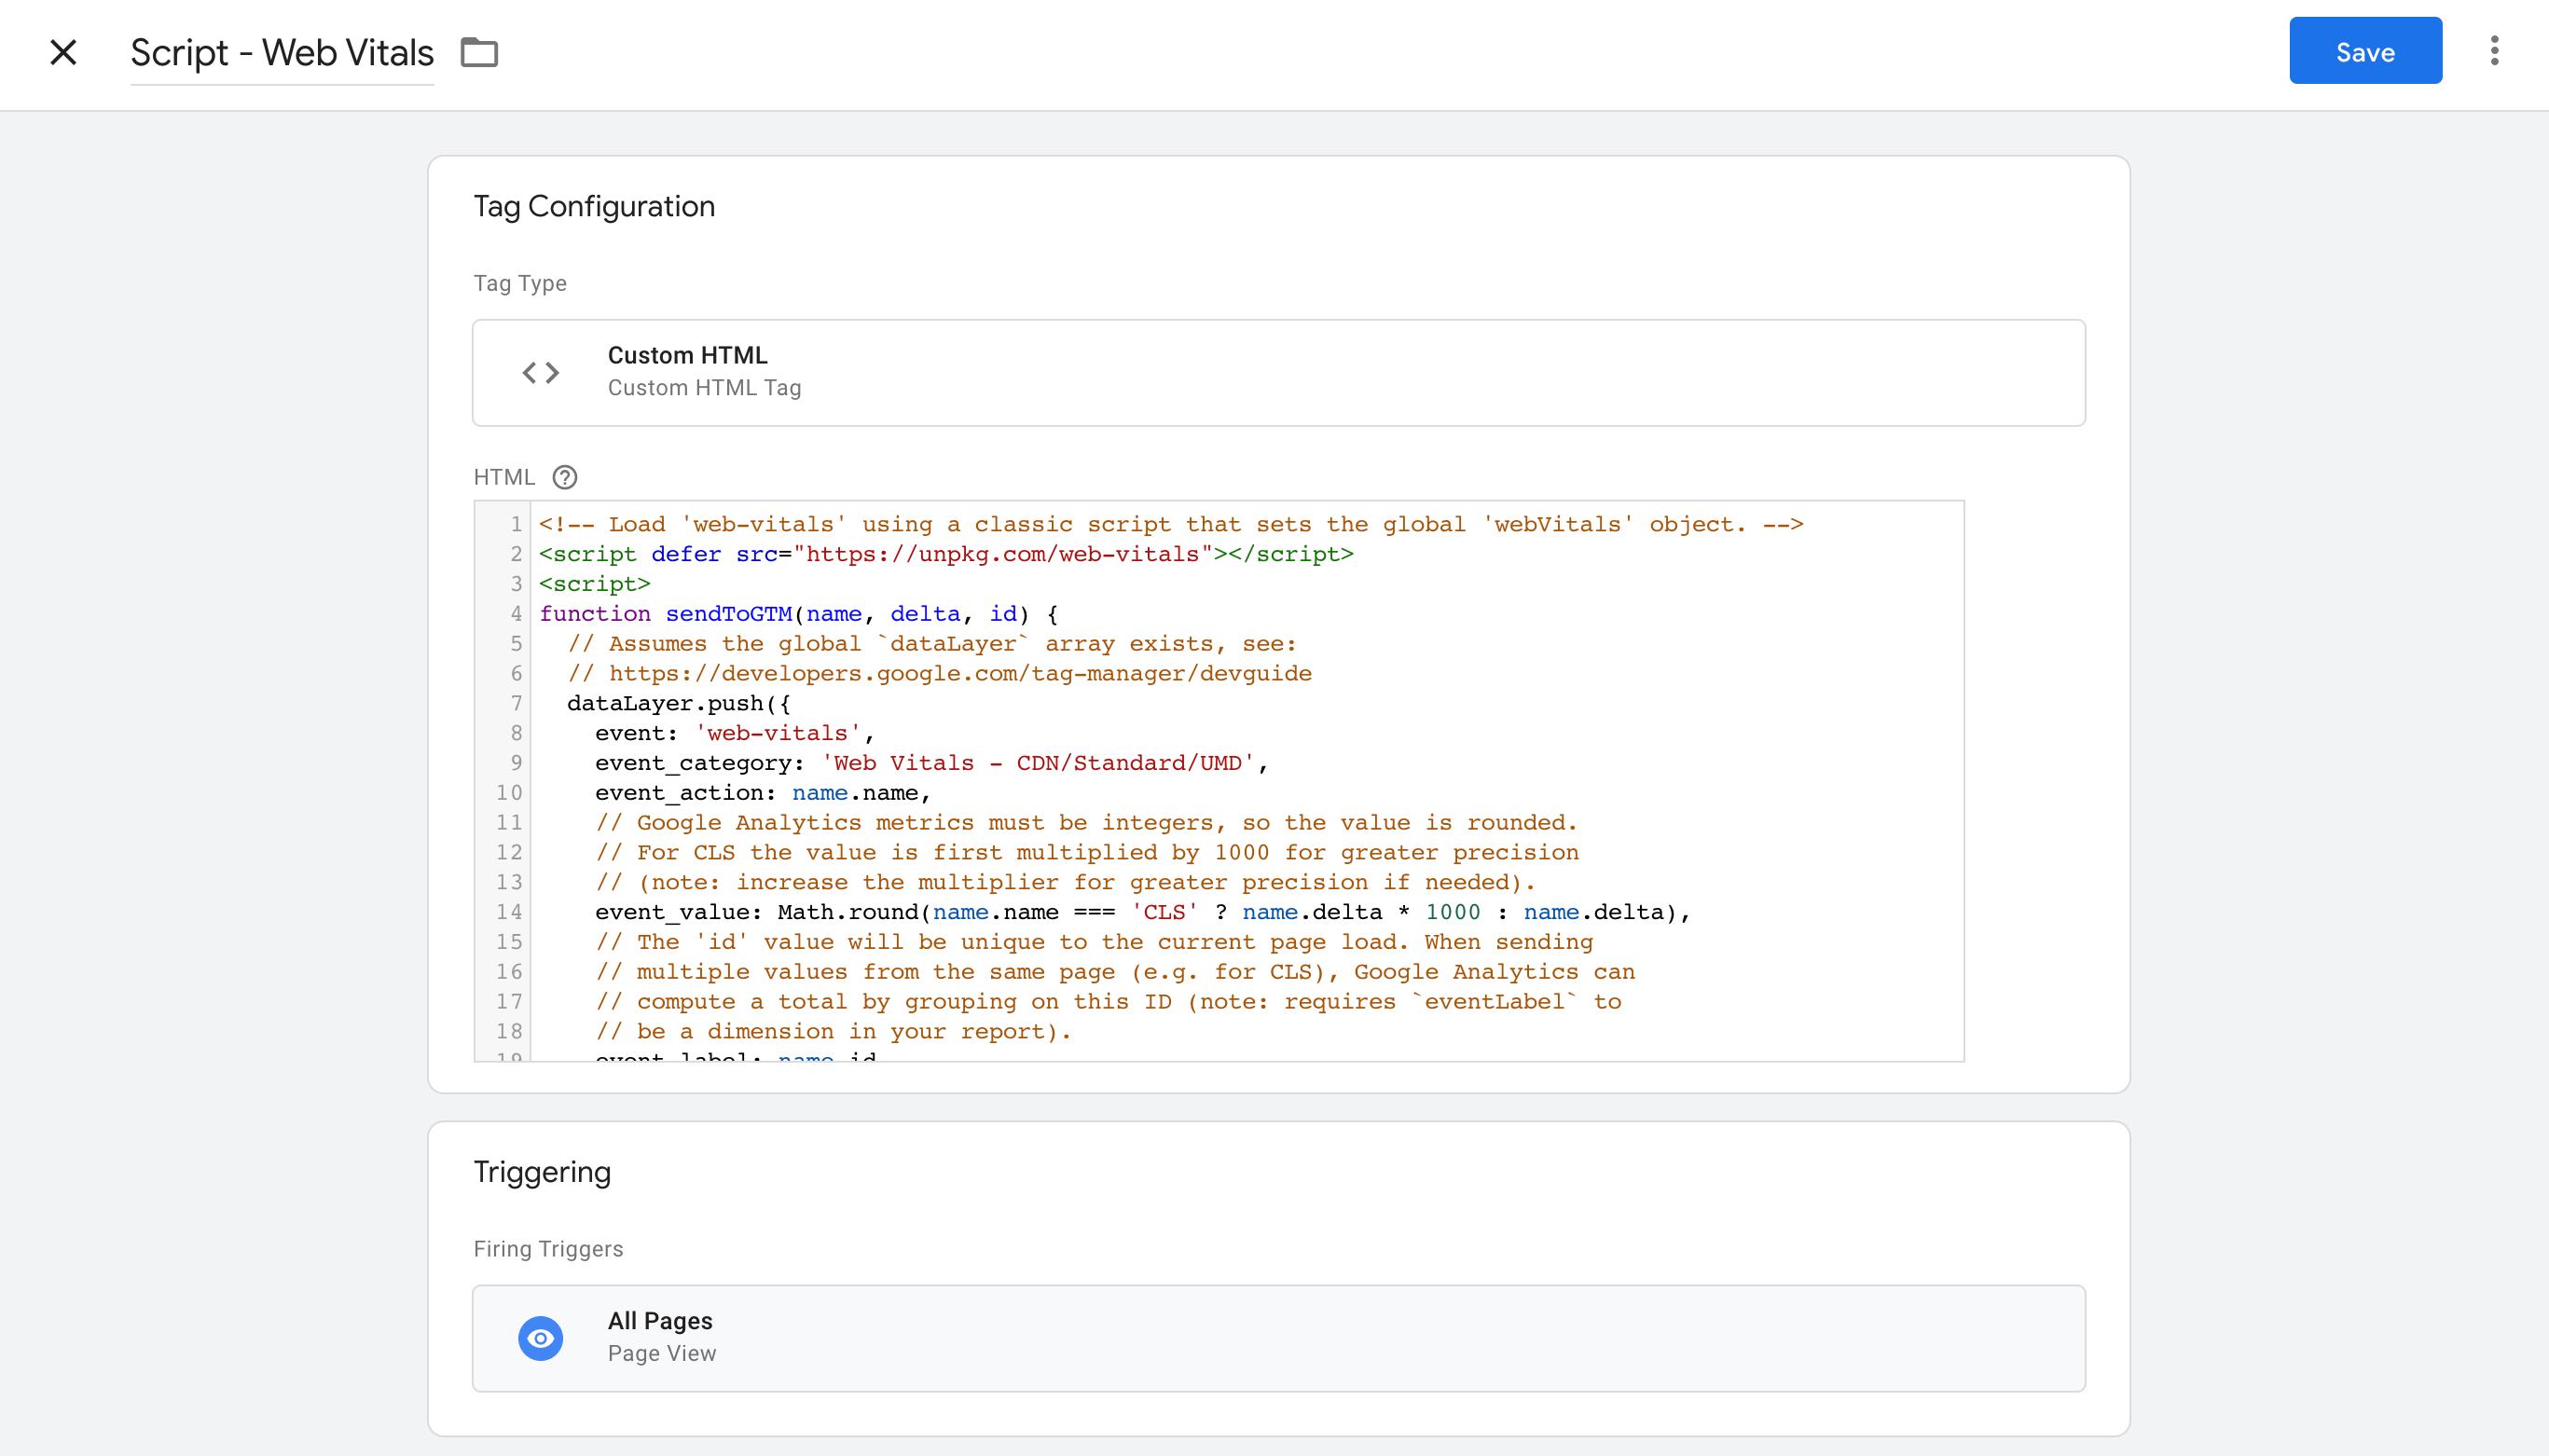 gtm_html-script_en web vitals measure web vitals measure field data Google Tag Manager field data